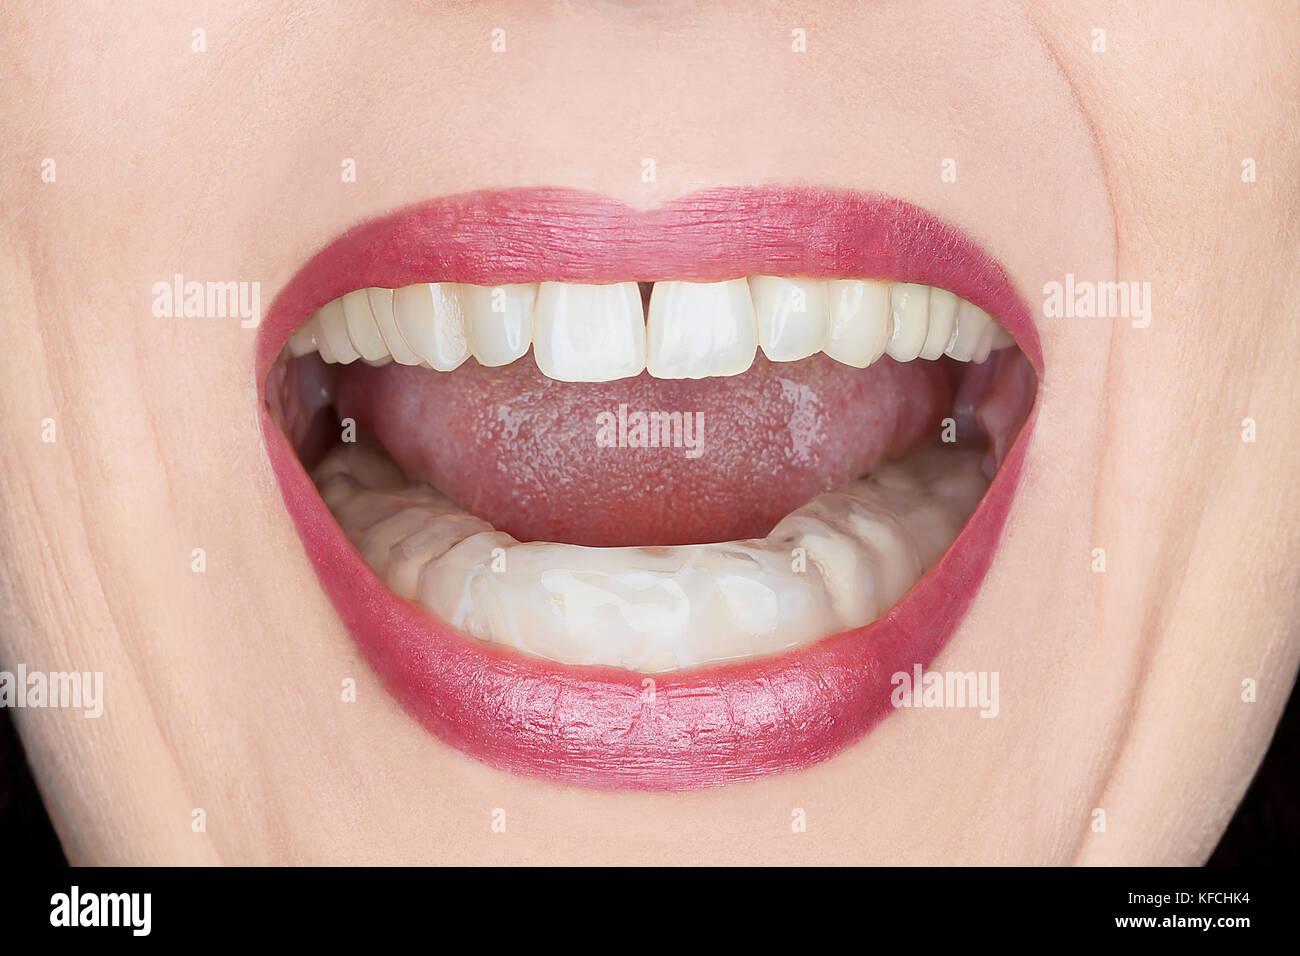 Teeth Grinding Stock Photos Teeth Grinding Stock Images Alamy